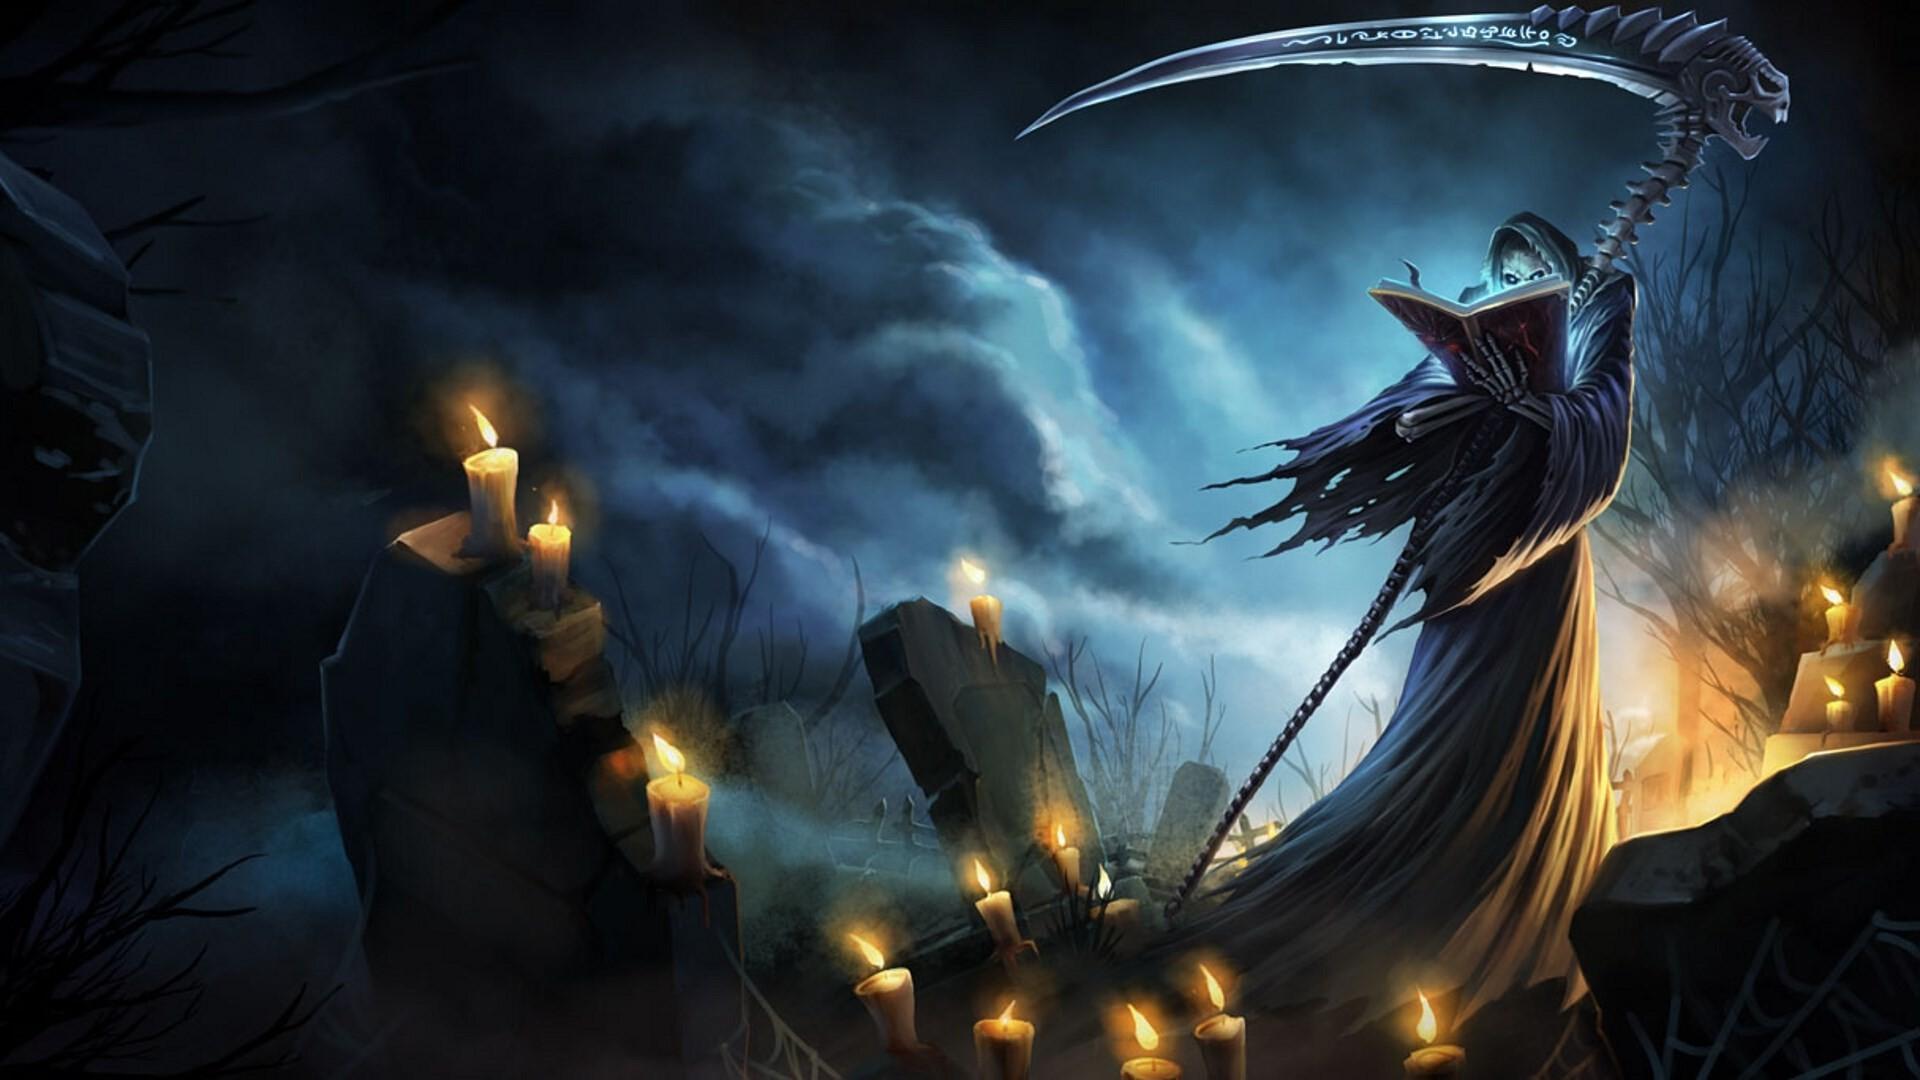 Grim Reaper Wallpaper 64 Pictures